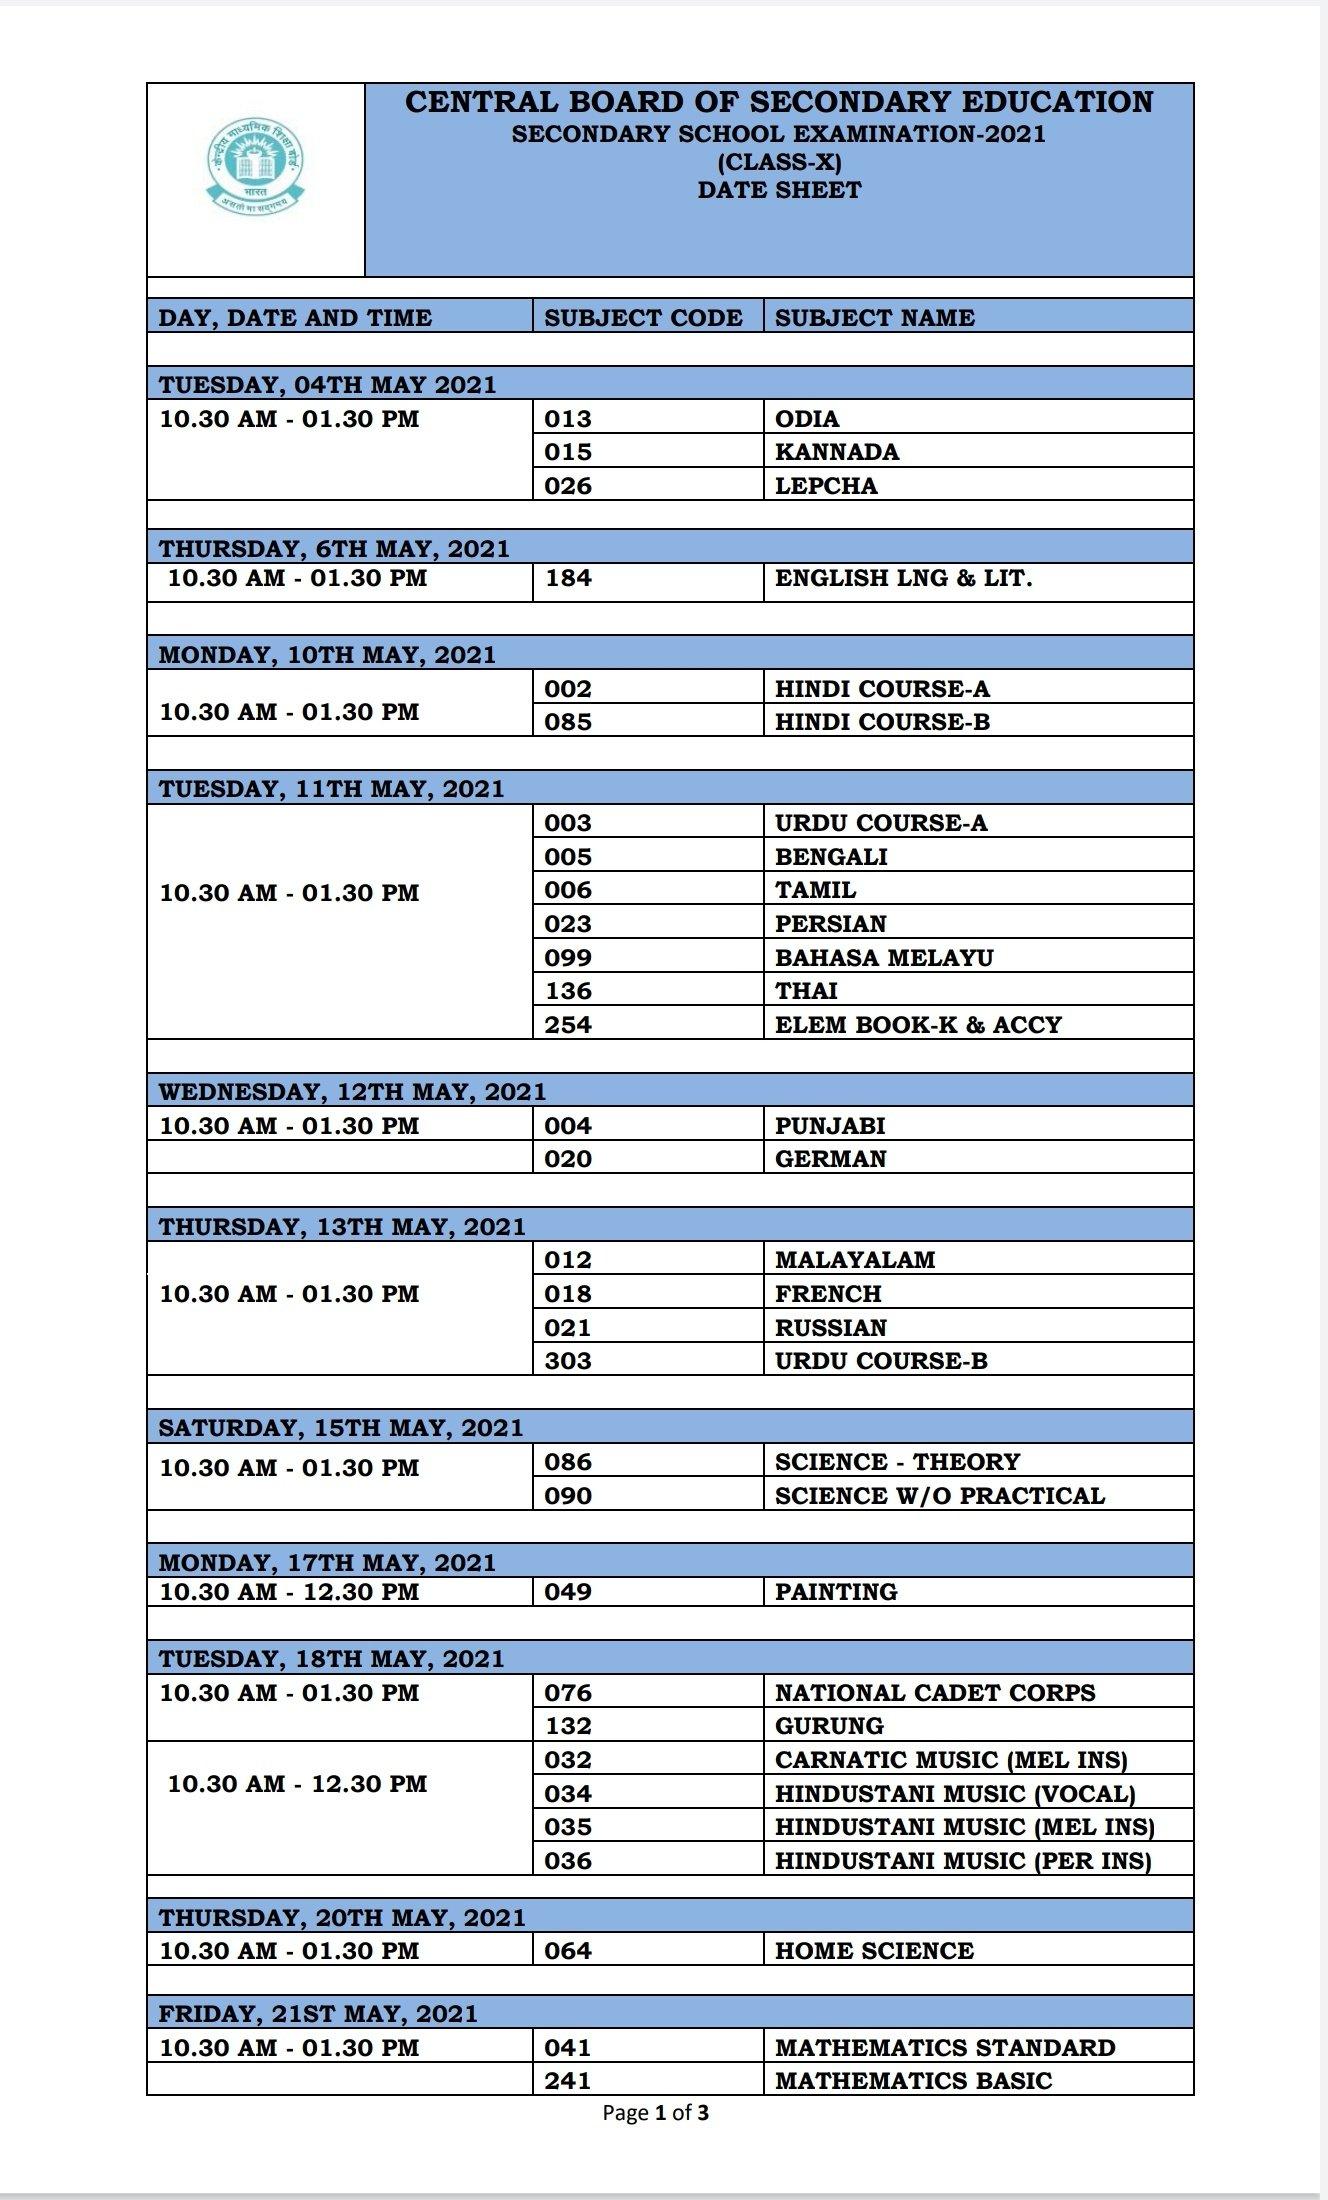 CBSE Datesheet 2021